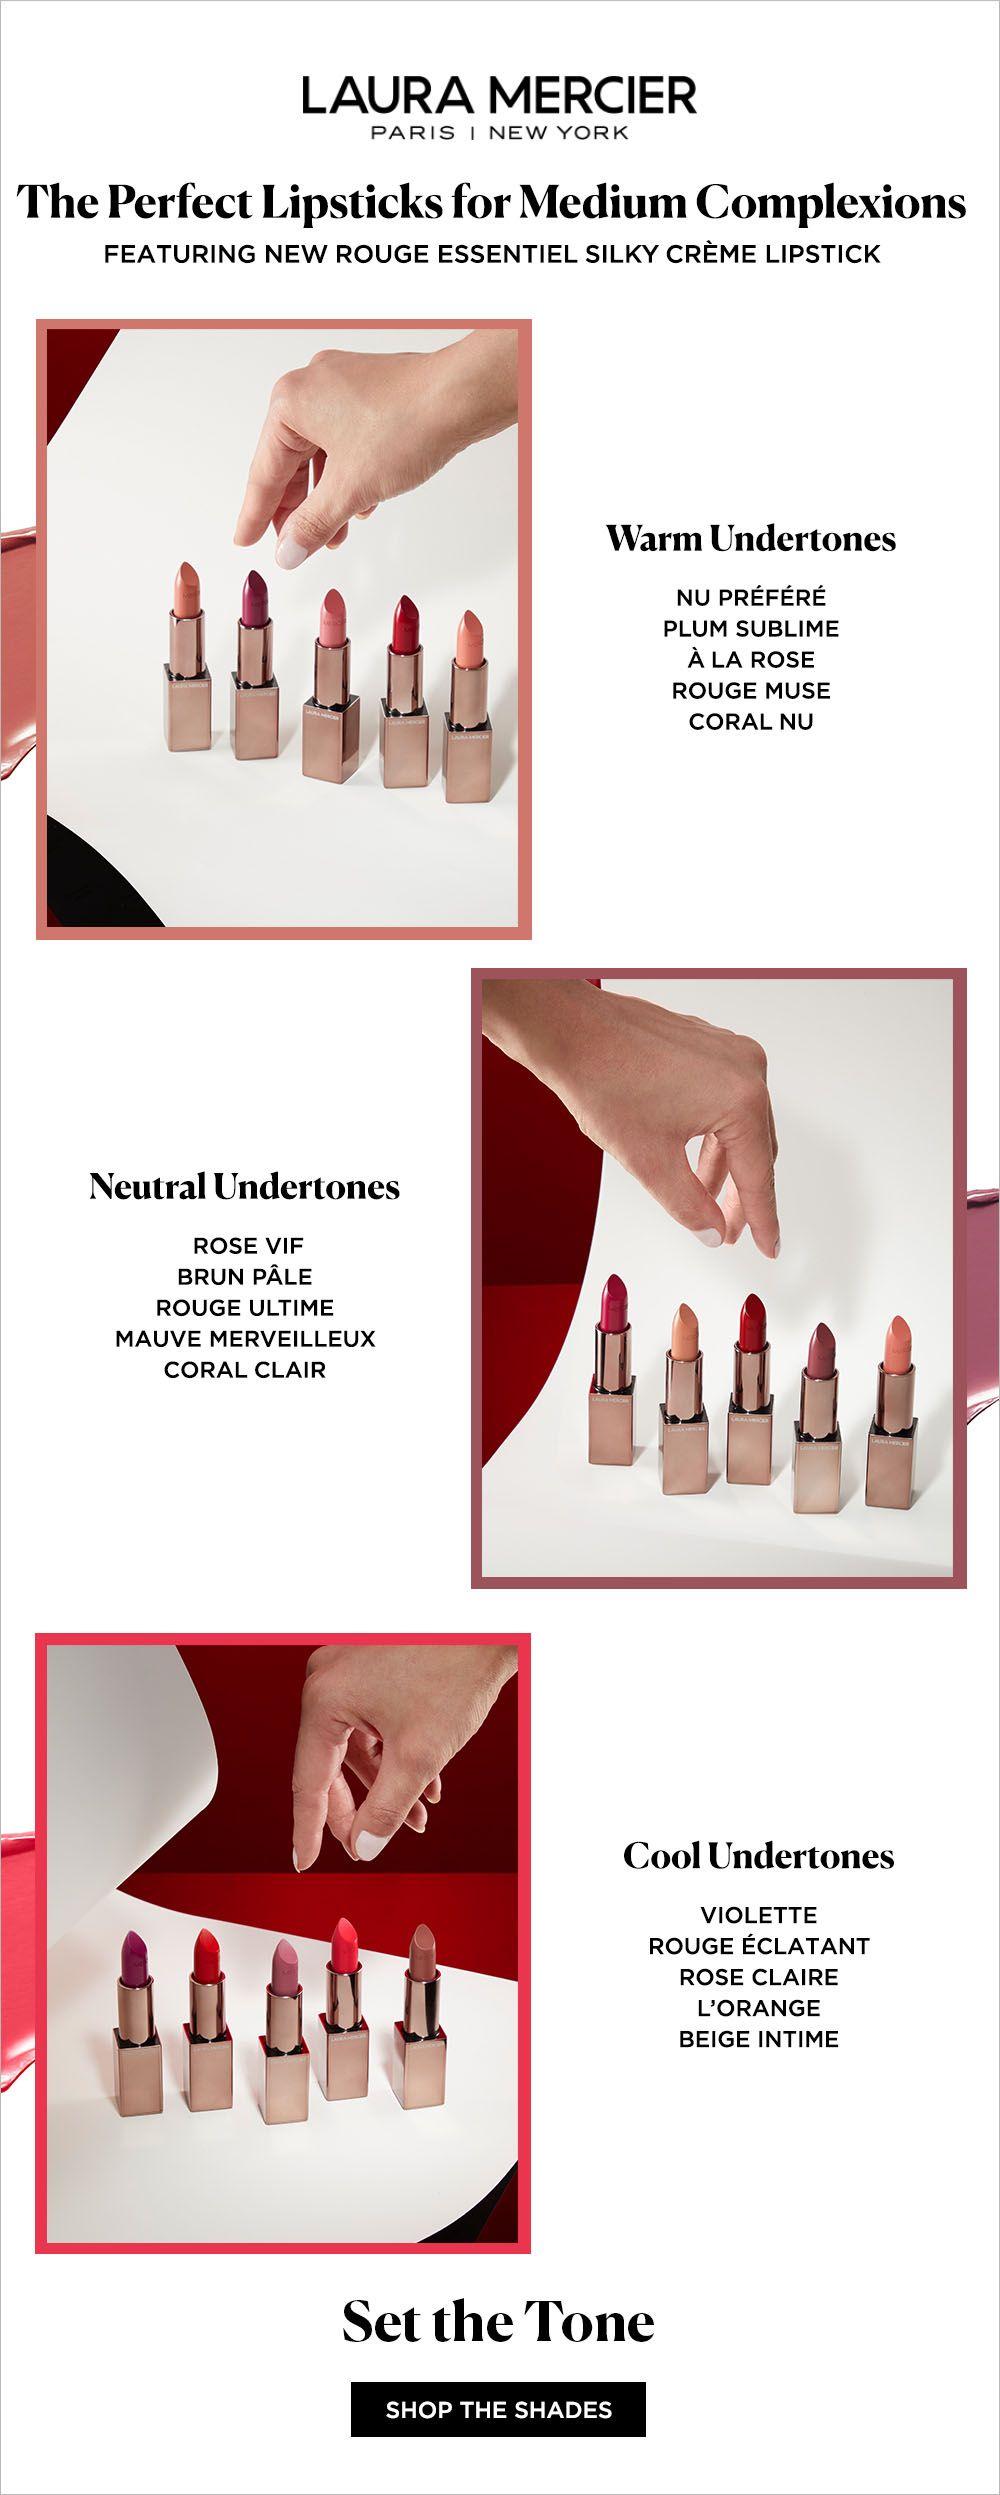 NEW Laura Mercier Rouge Essentiel Silky Crème Lipstick features 30 ...